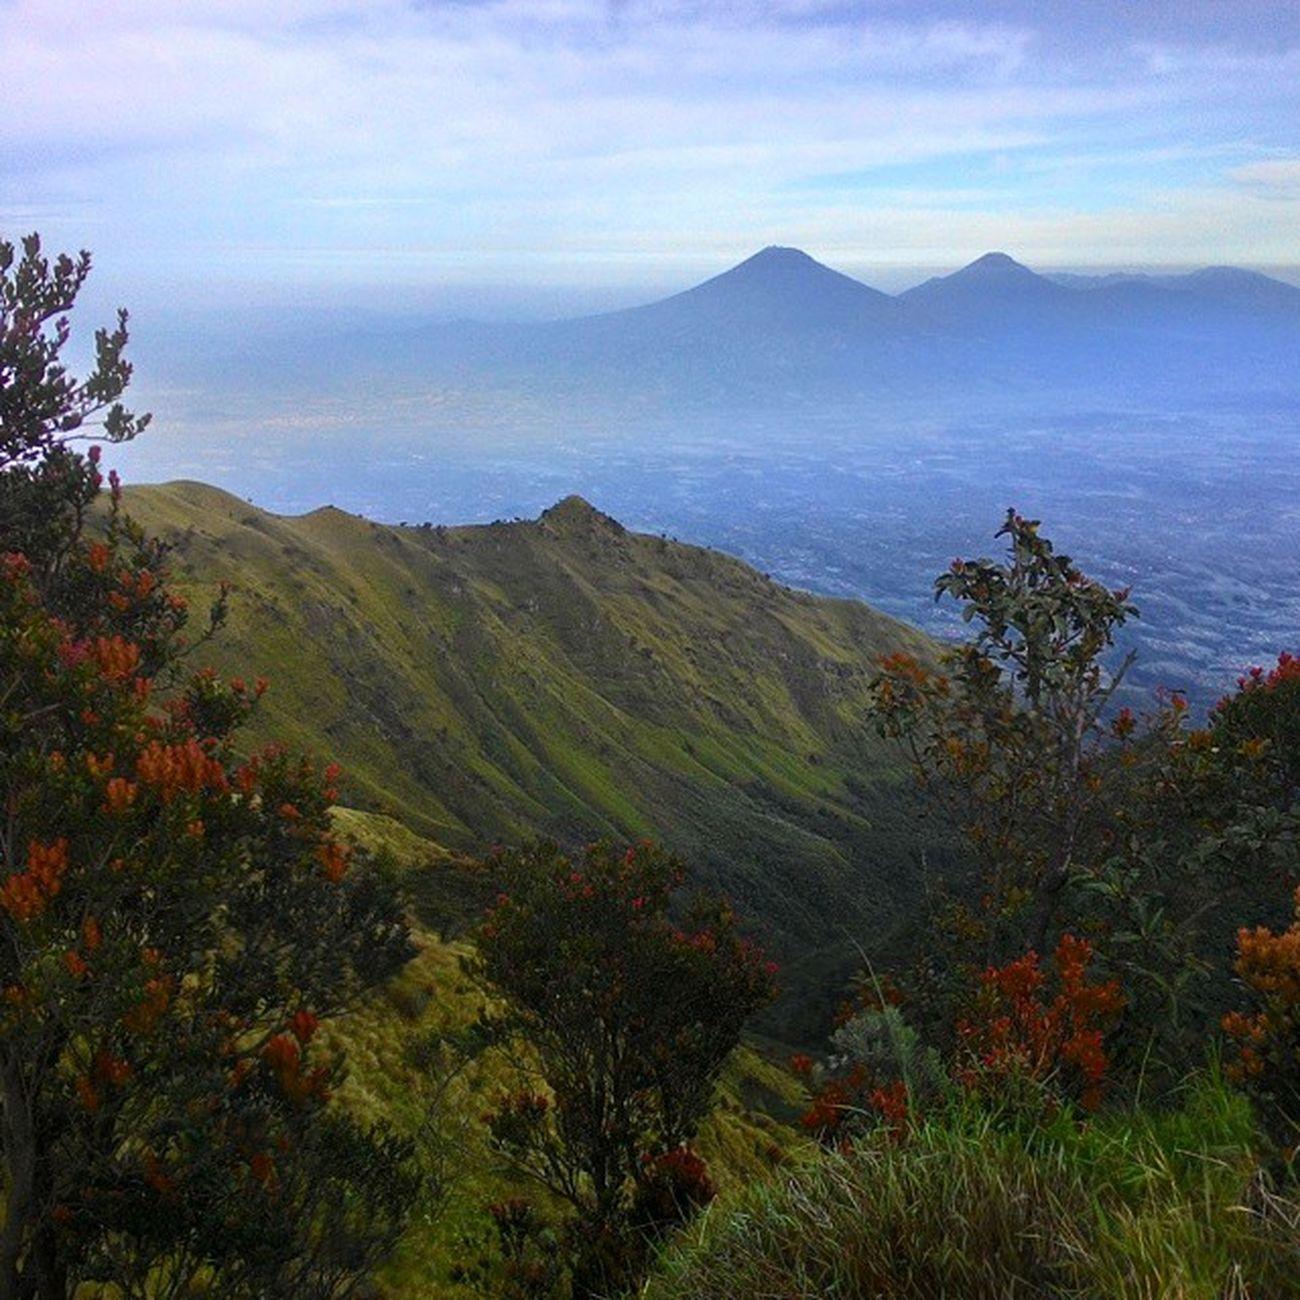 tampak Sindoro Sumbing dari Puncaksyarif Explorecentraljava Exploreindonesia Indotravellers Id_pendaki Doyandolan Betahngemprah Pergilagi